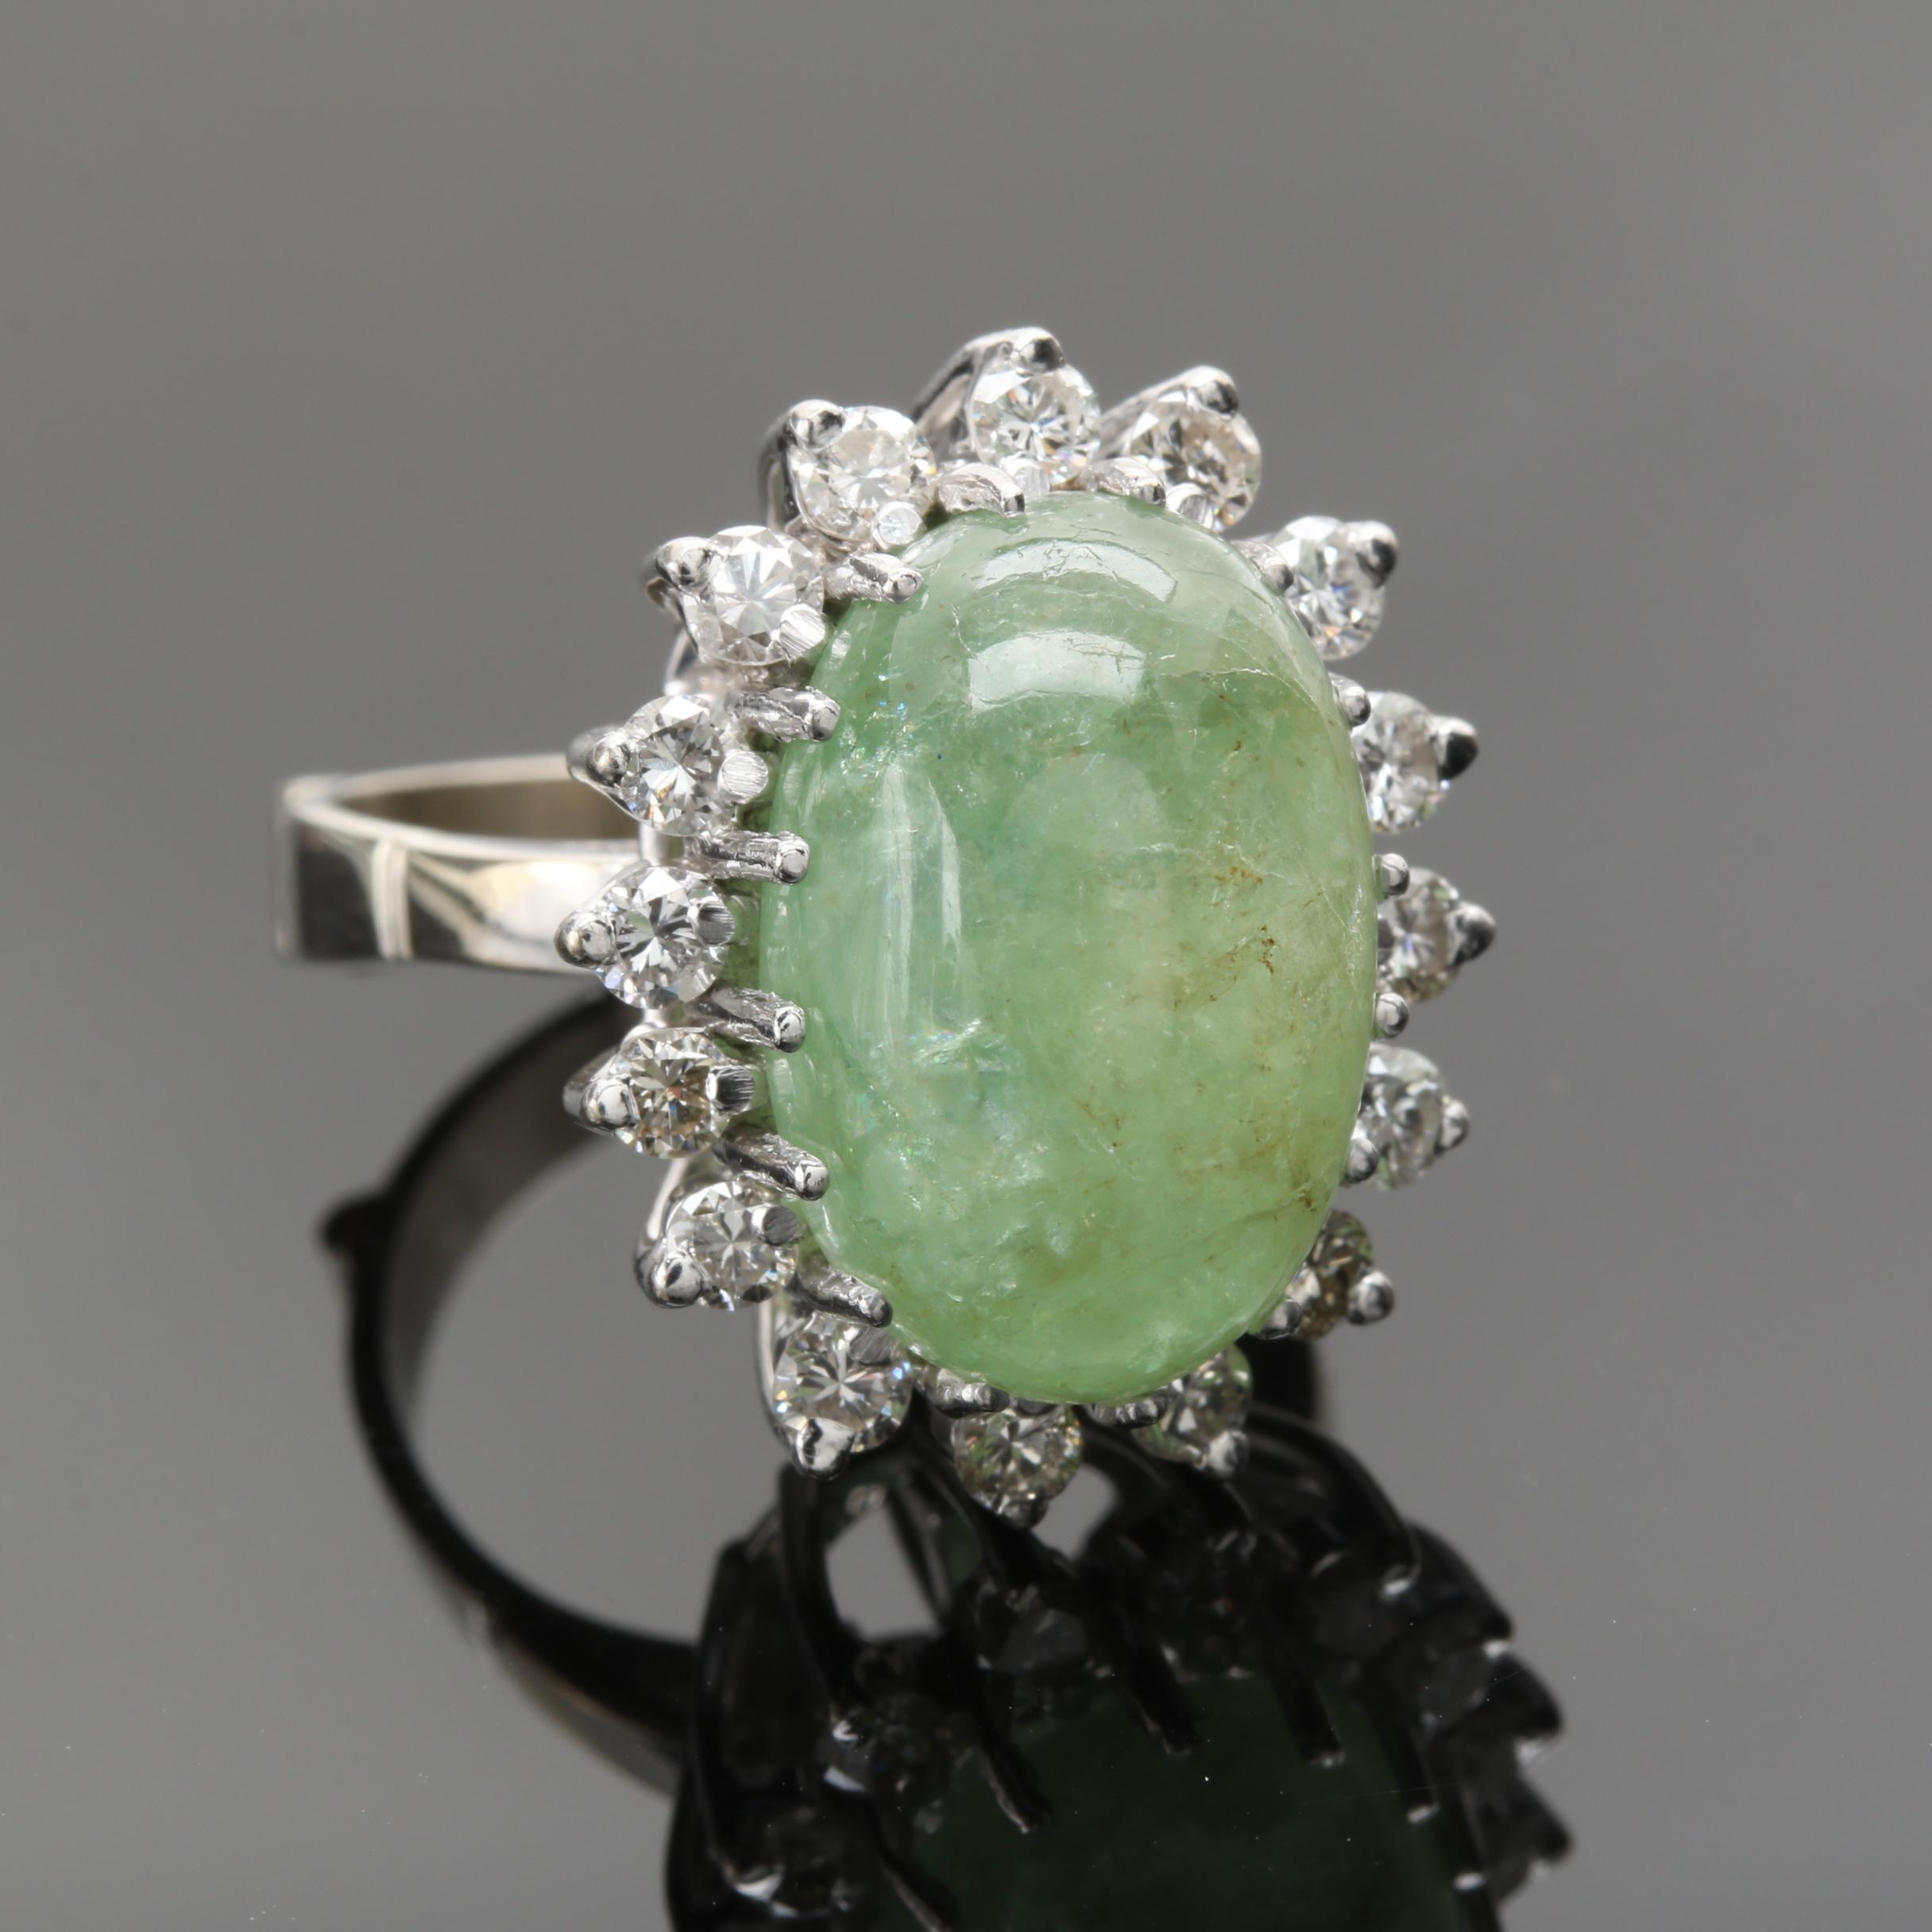 14K White Gold Green Beryl and 0.96 CTW Diamond Ring Pendant